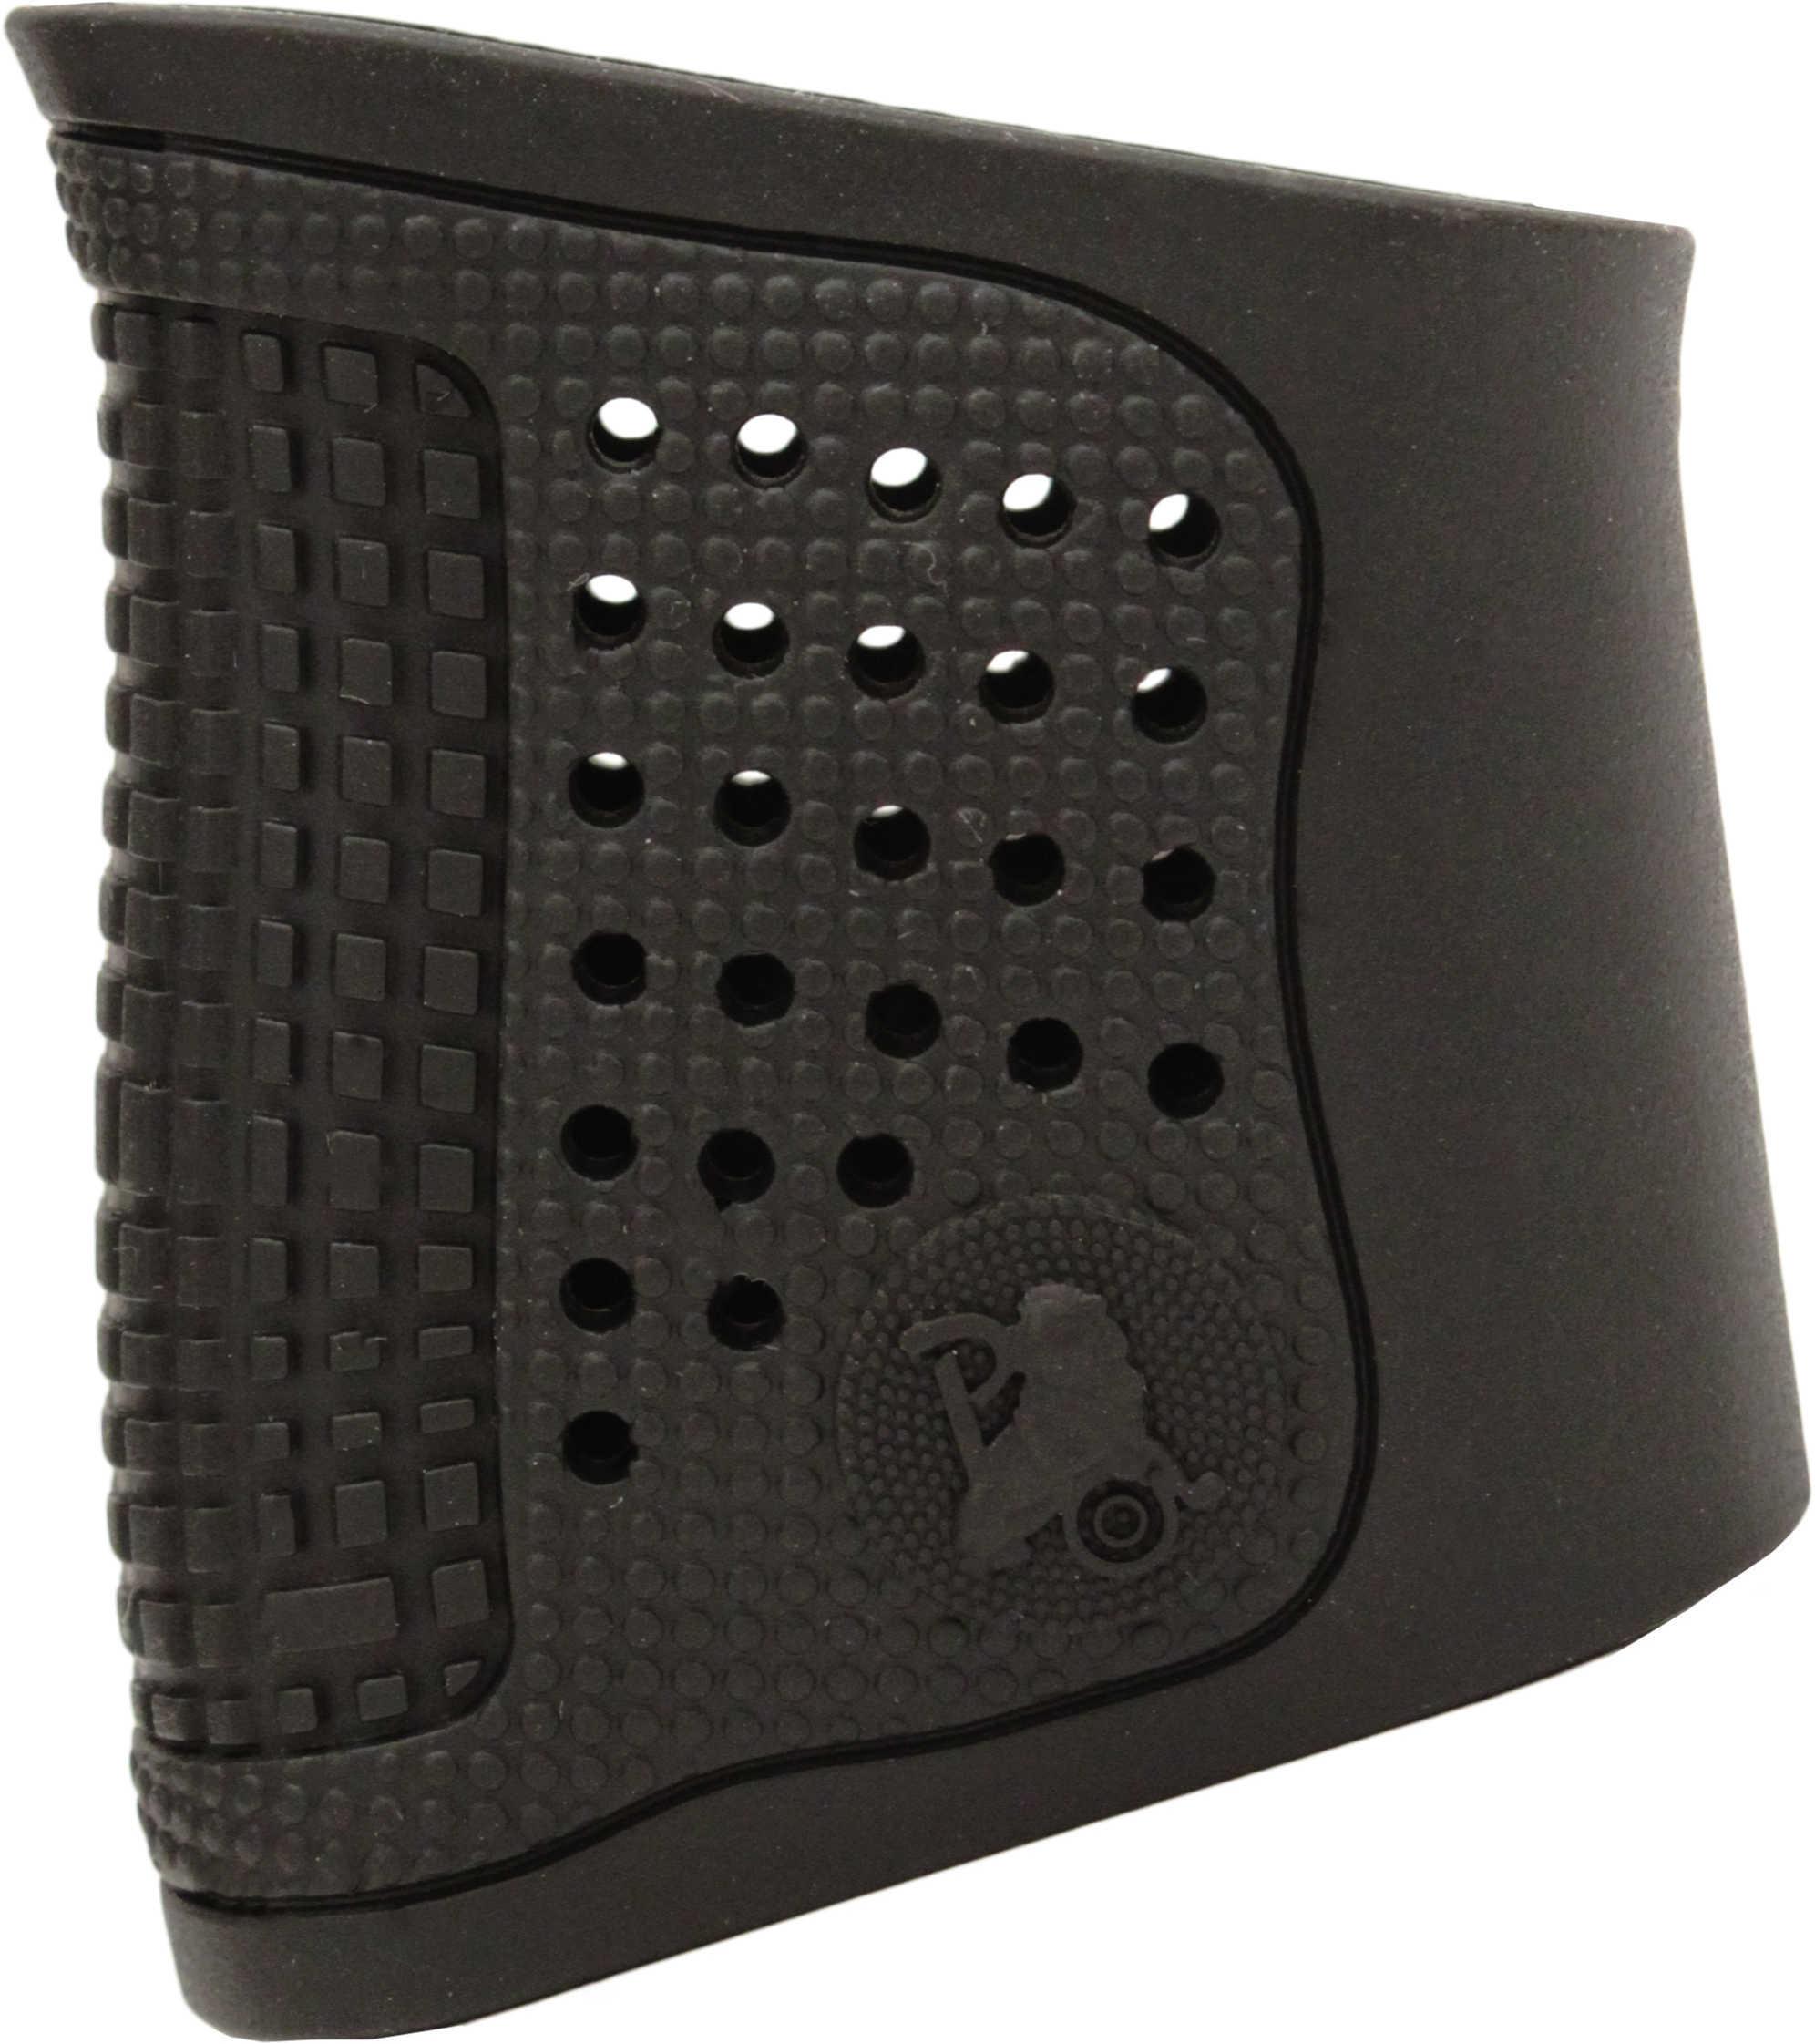 LYM Grip Glove KAHR Cw9 Cw40 P9 P40